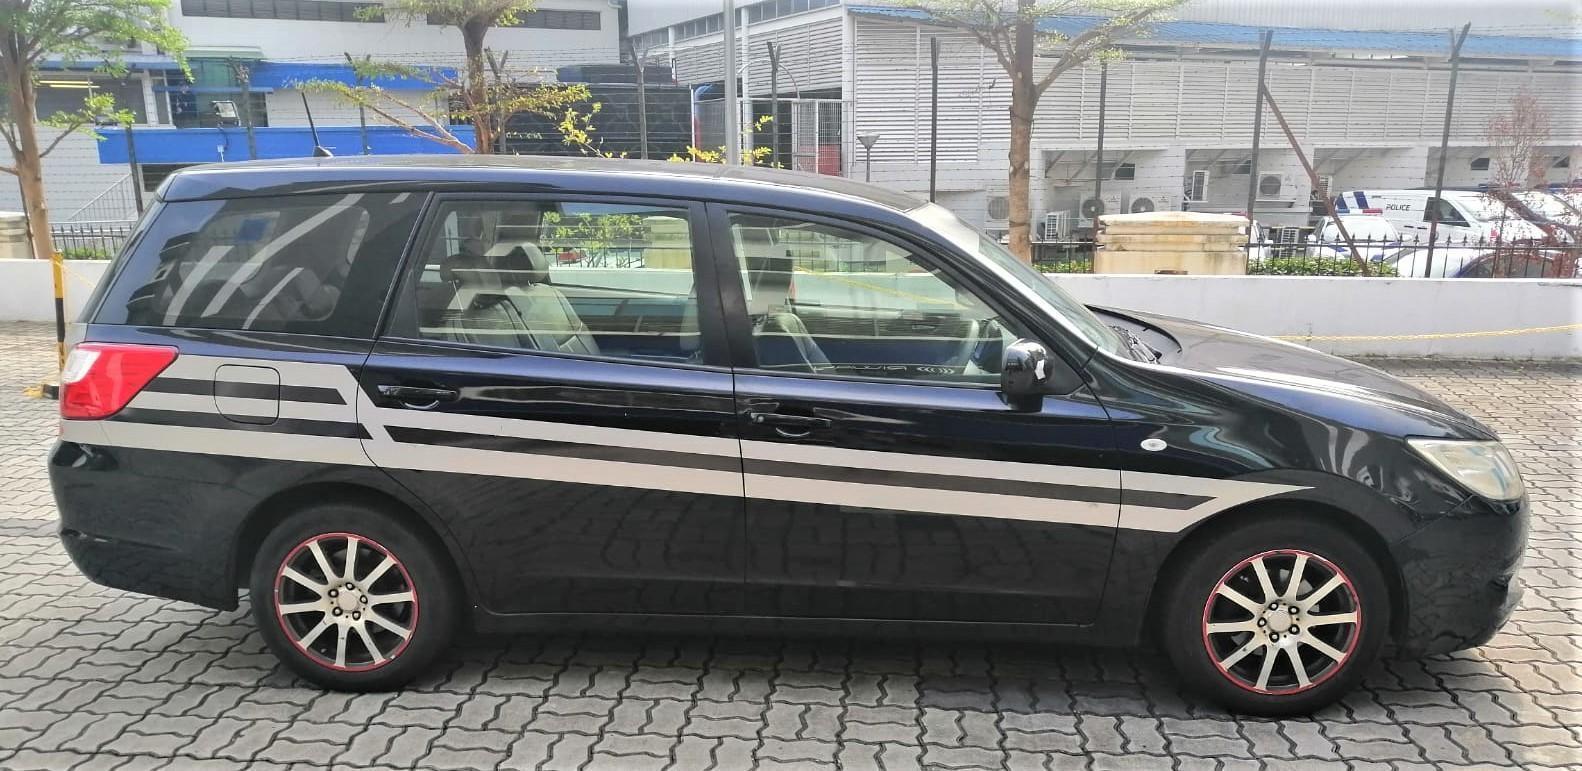 Subaru Exiga 2.0A @ Lowest rental rates, good condition!